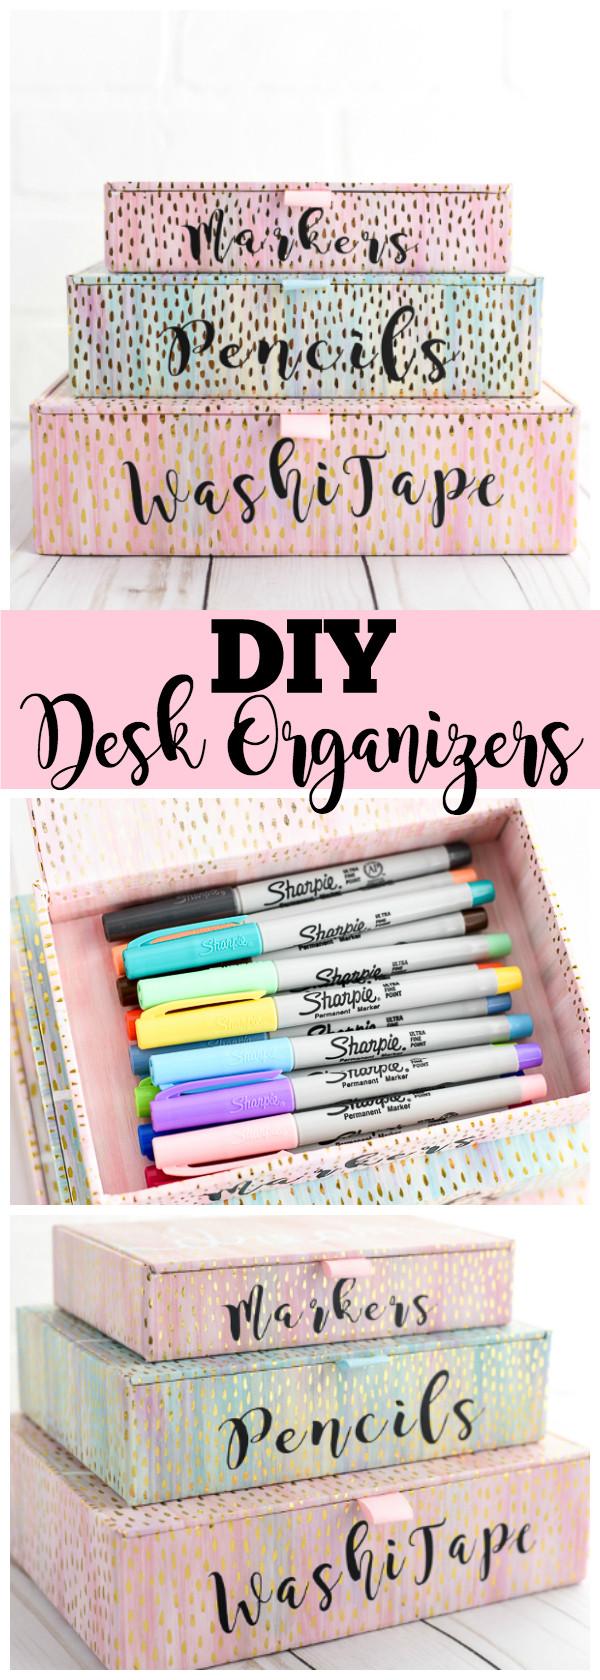 Diy Desk Organization  DIY Desk Organizers